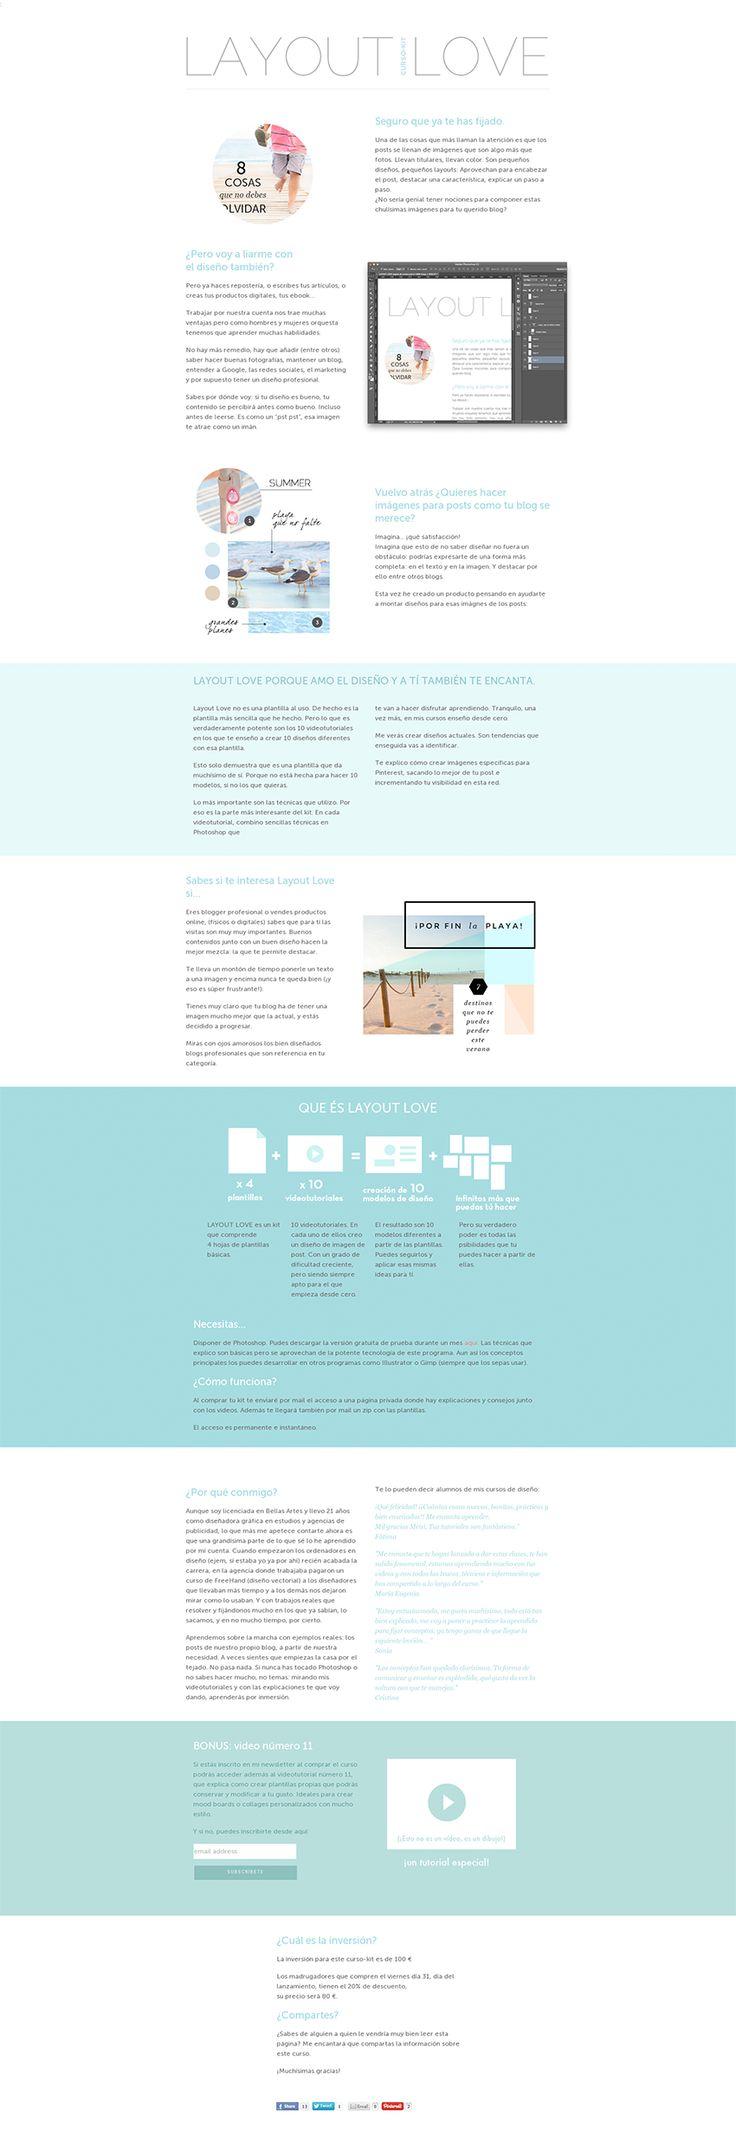 Layout Love, curso-kit de diseño de Imágenes para posts. #posts #diseñografico #blog #blogdessign #curso #cursoonline #kit #webdesign #layout